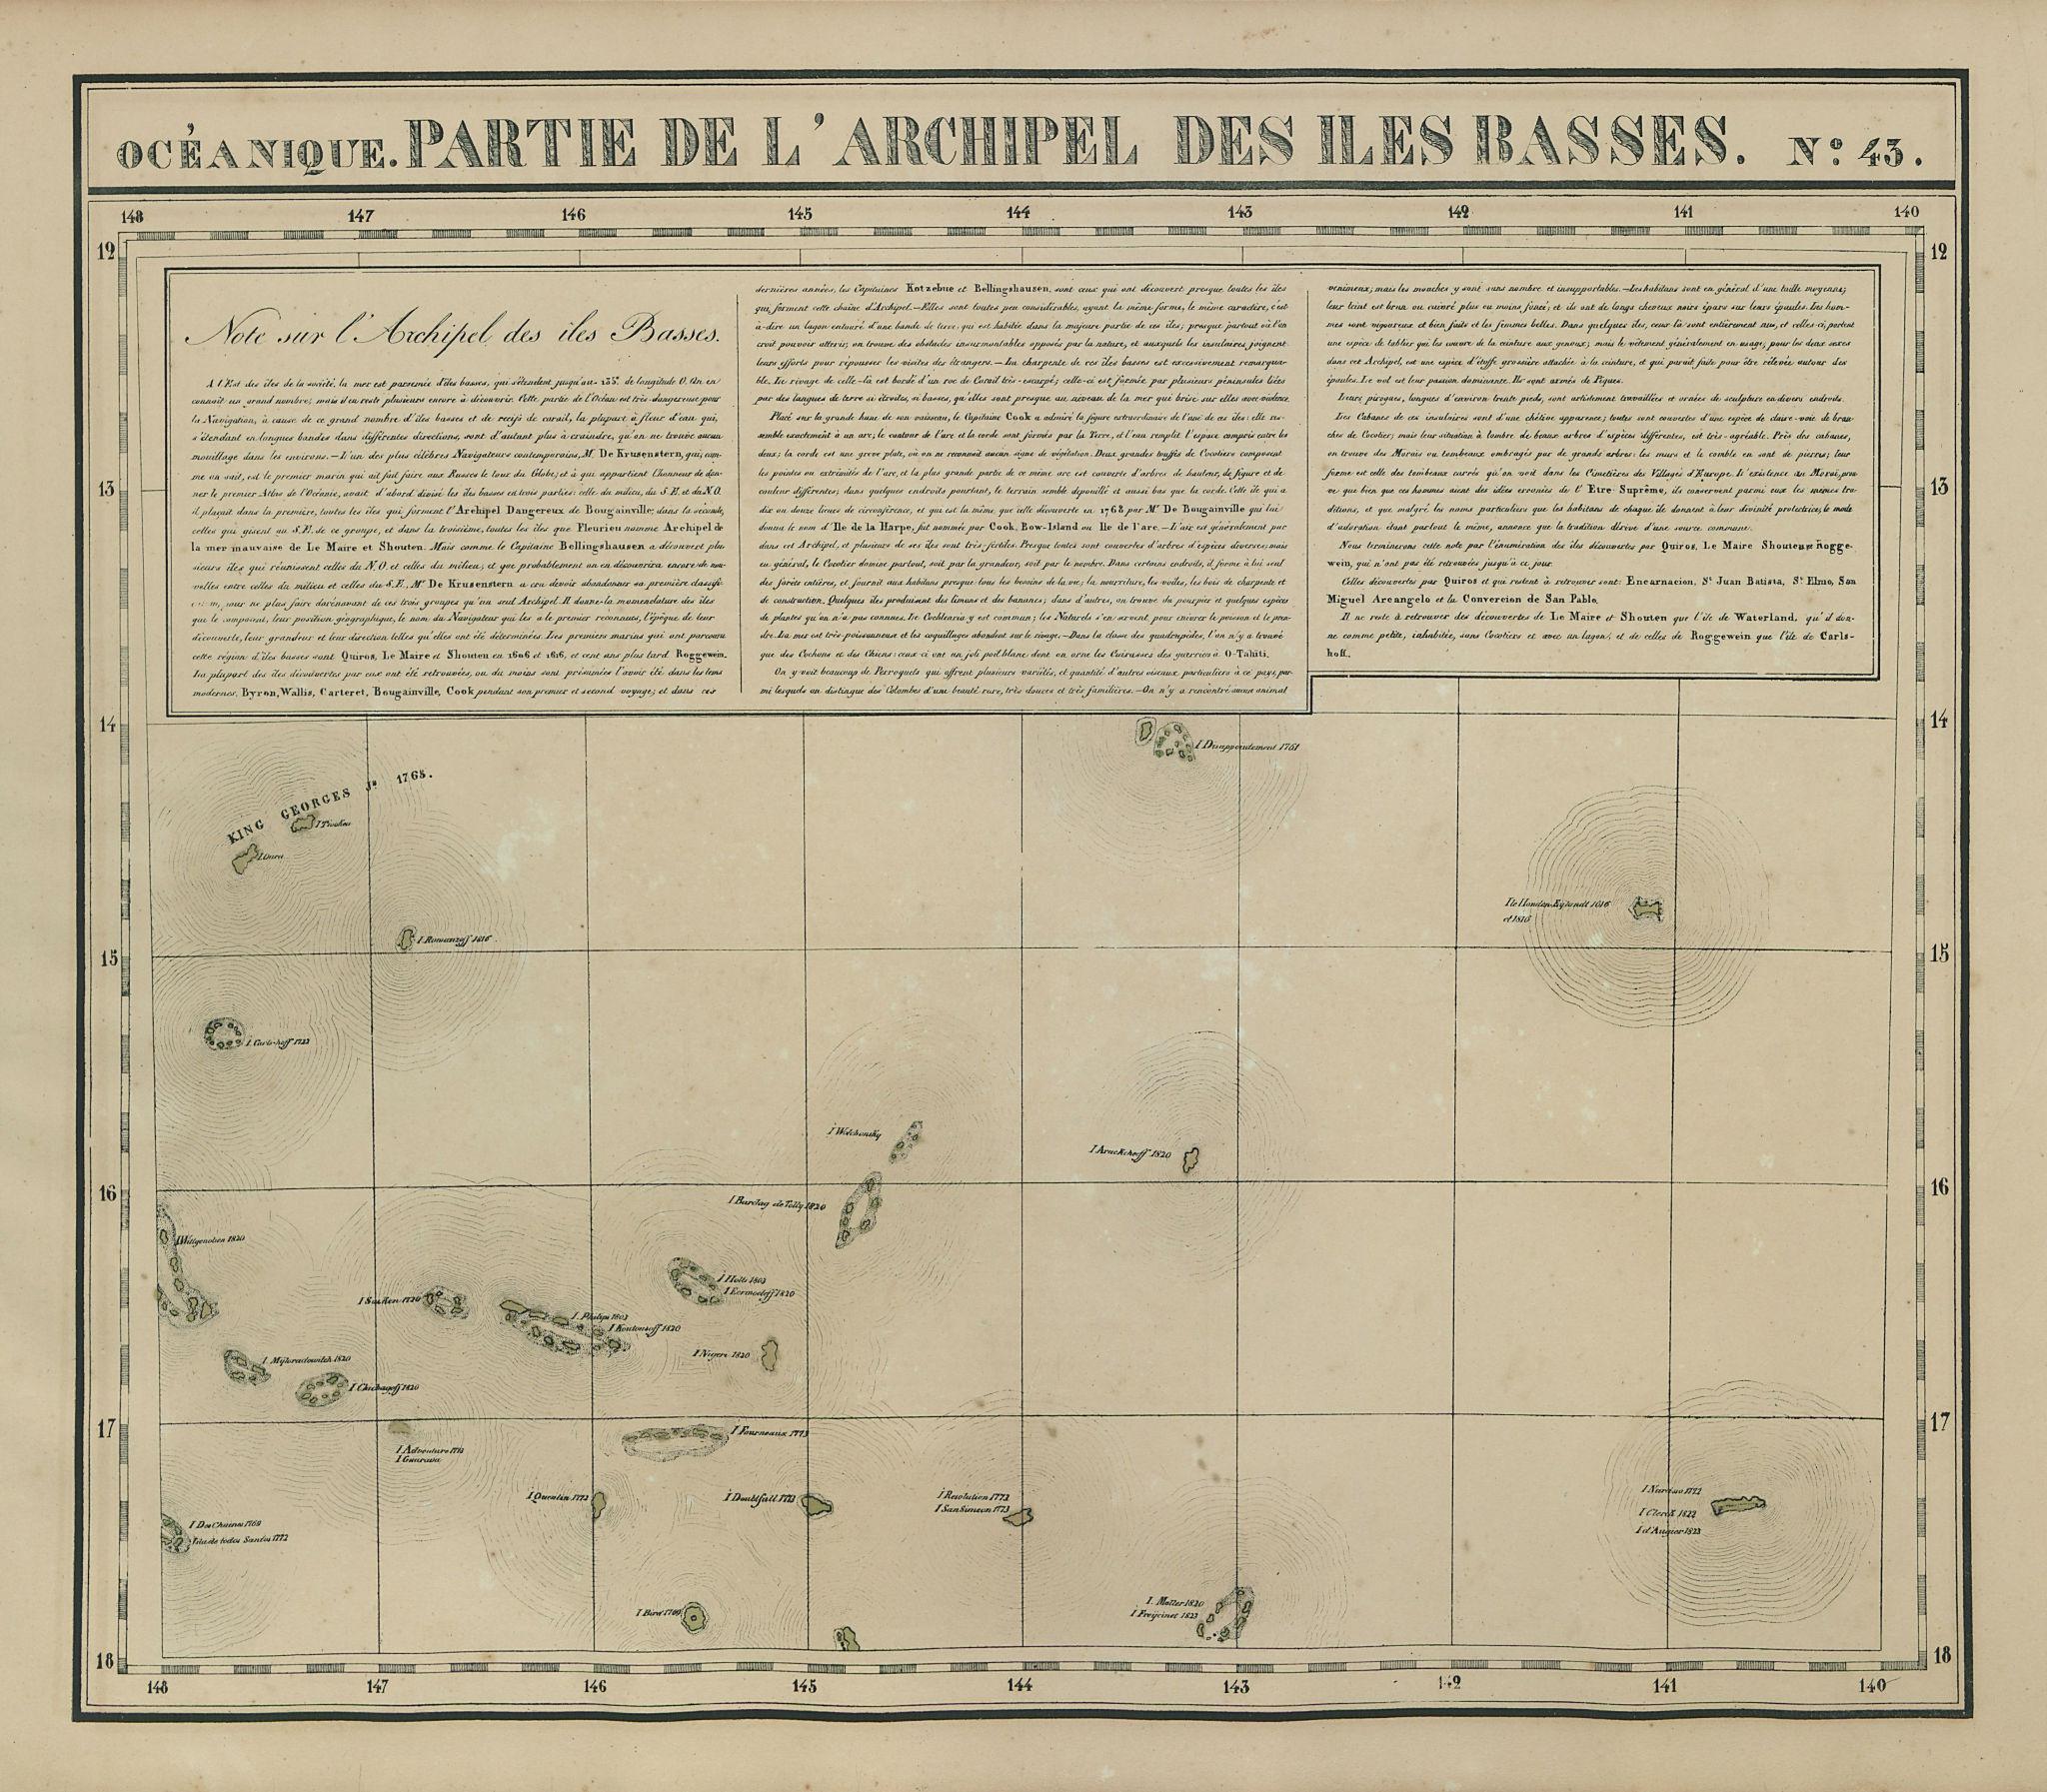 Océanique Partie… des Iles Basses 43 NE Tuamotus Polynesia VANDERMAELEN 1827 map